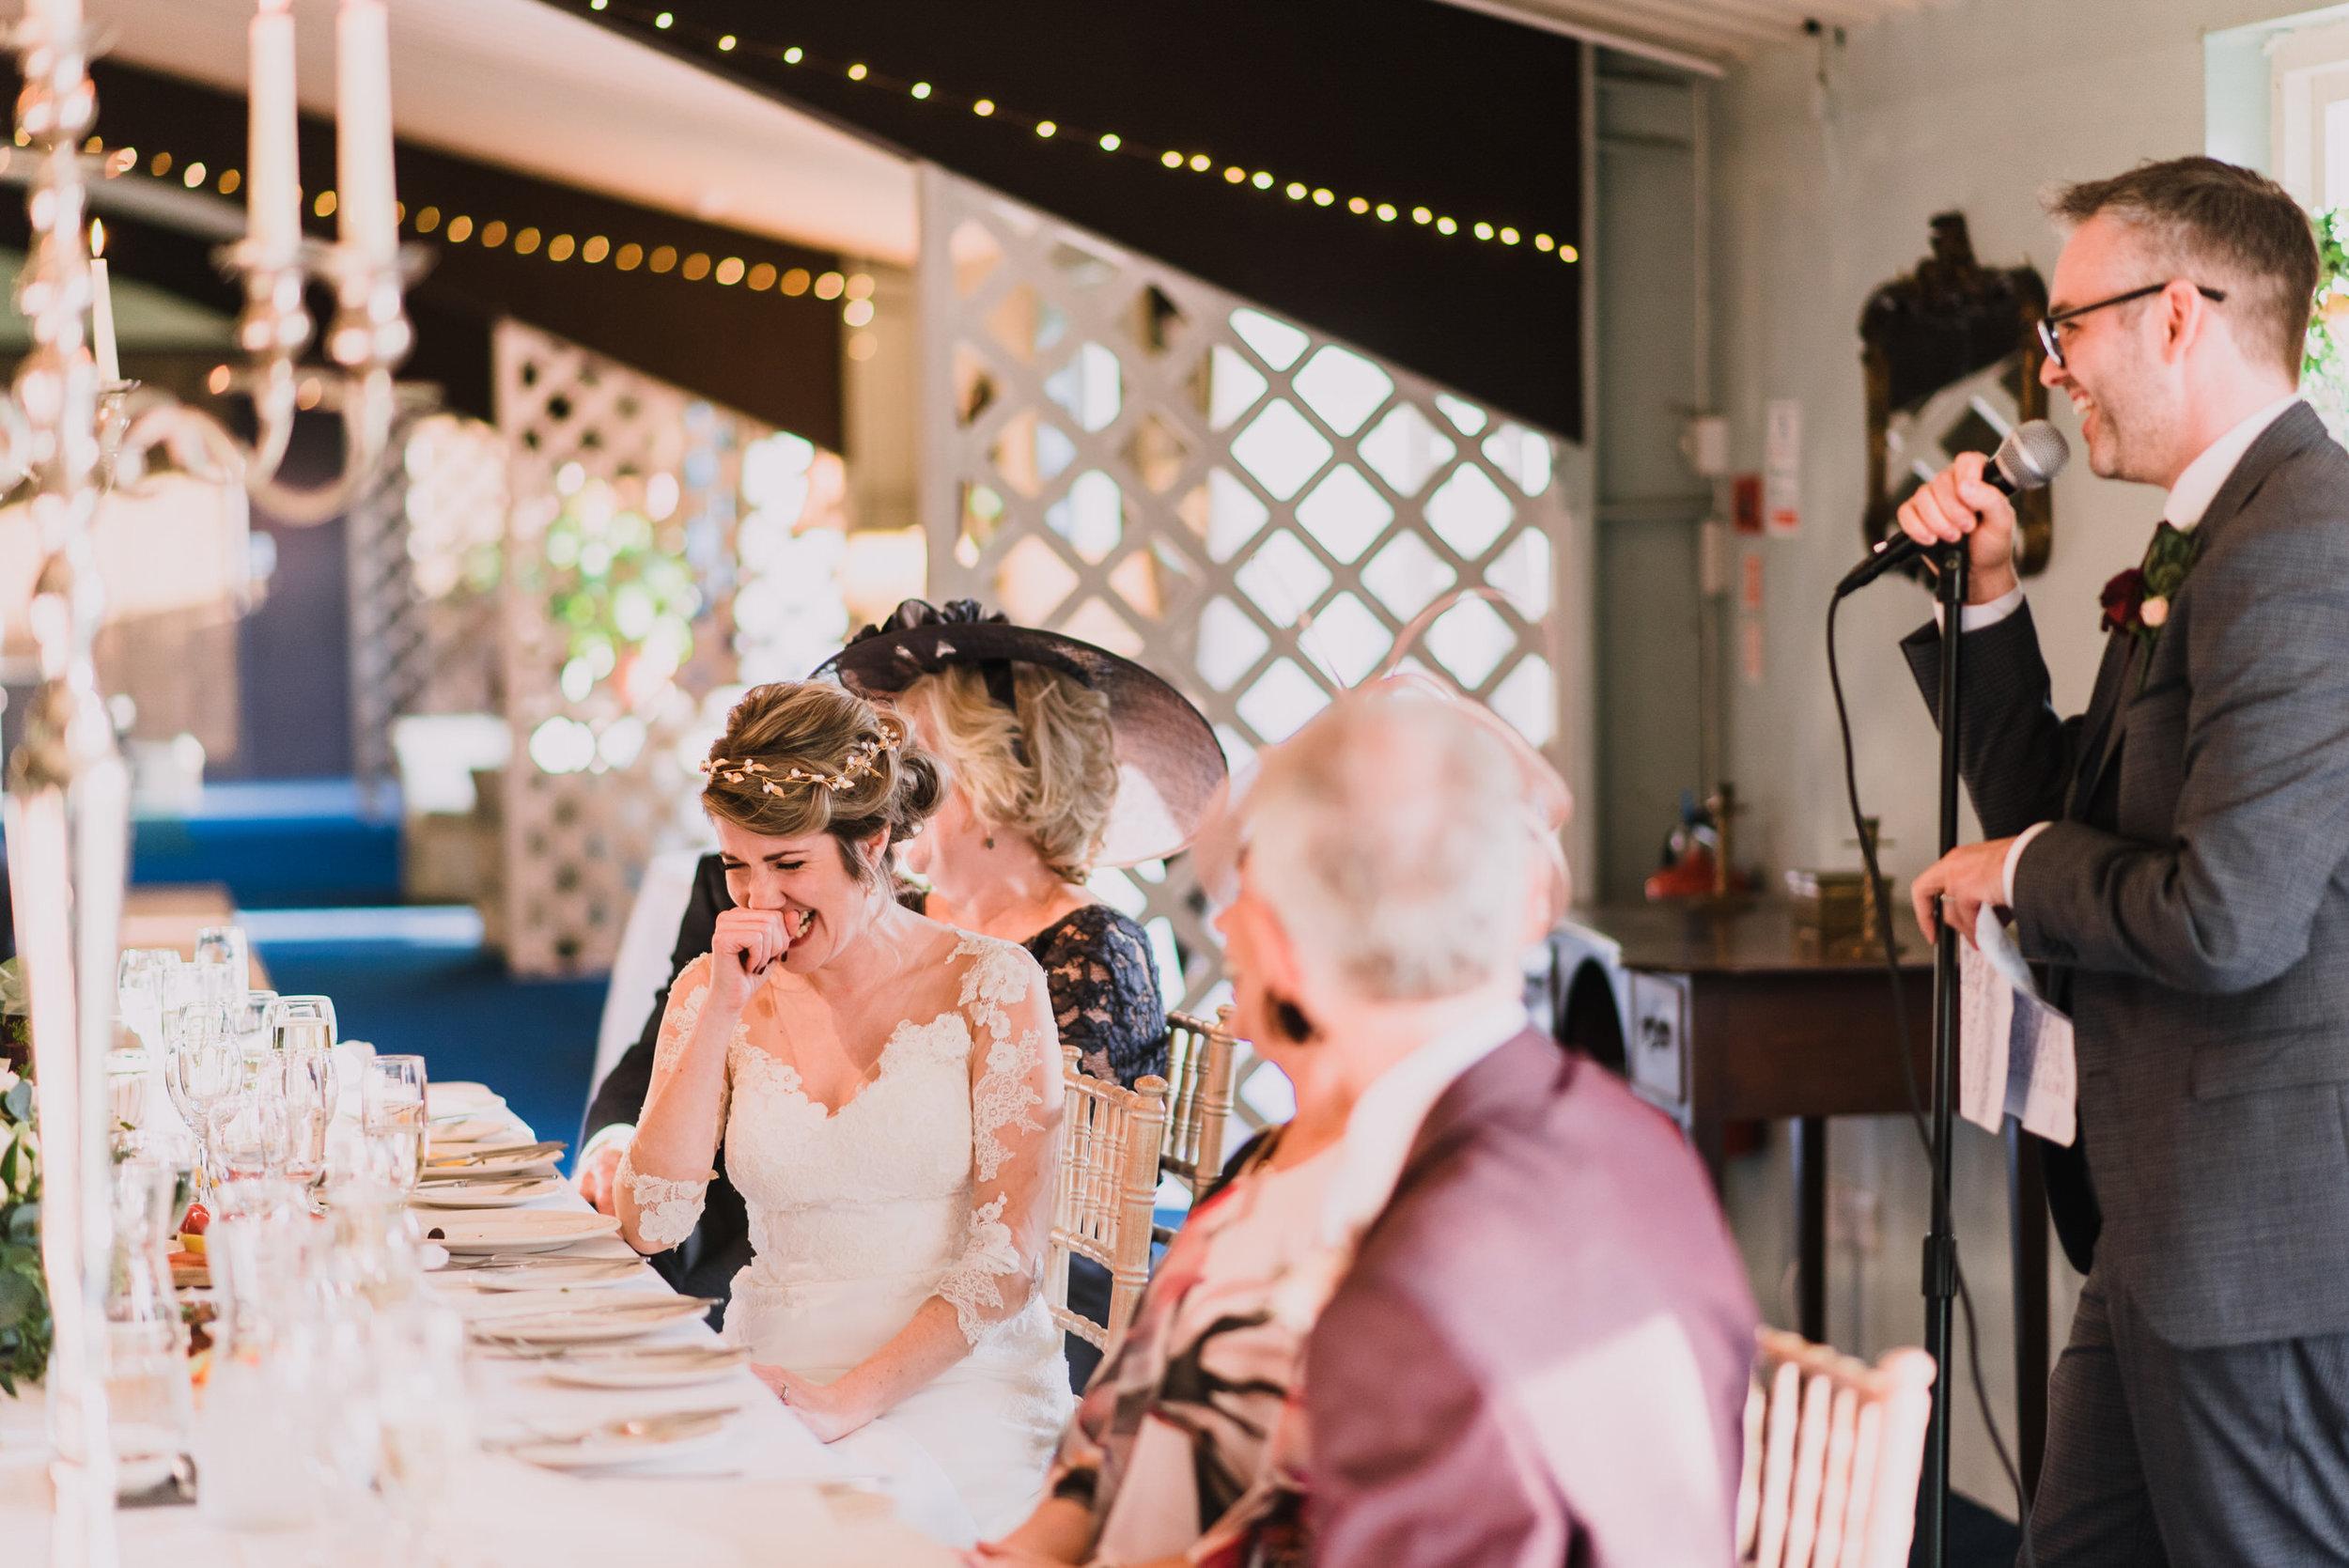 lissanoure castle wedding, northern ireland wedding photographer, romantic northern irish wedding venue, castle wedding ireland, natural wedding photography ni (115).jpg